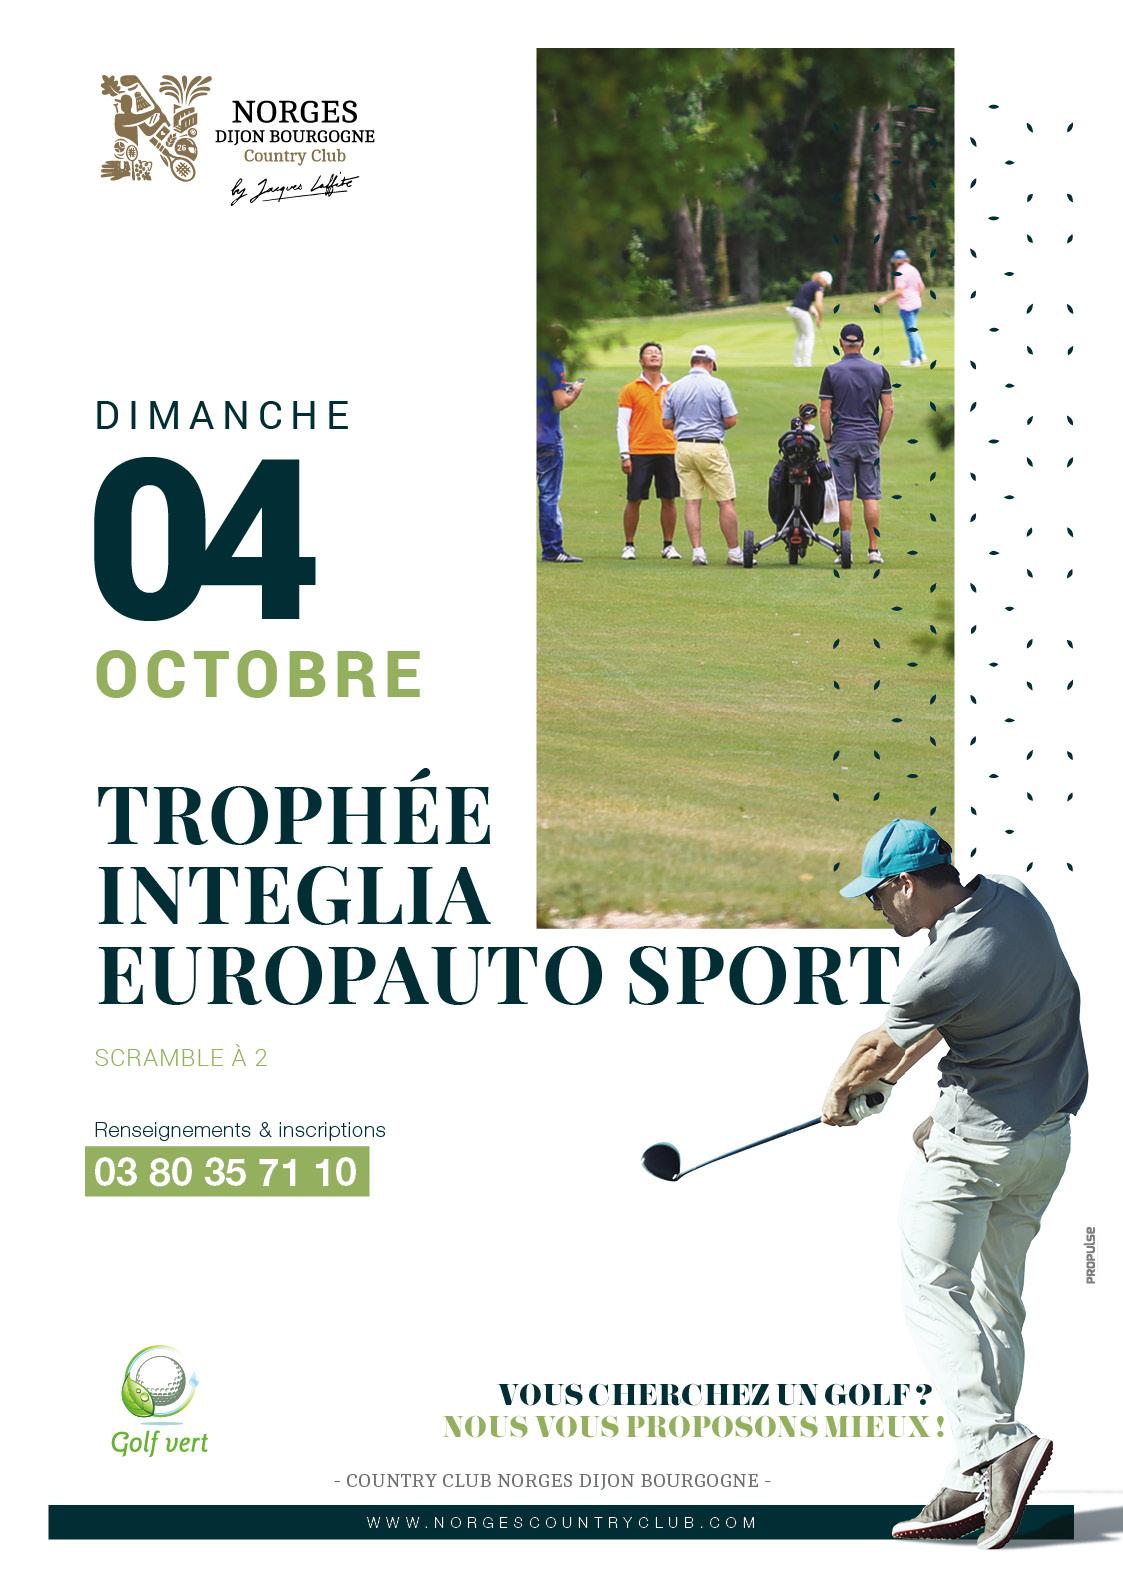 Trophée Integlia Europauto sport